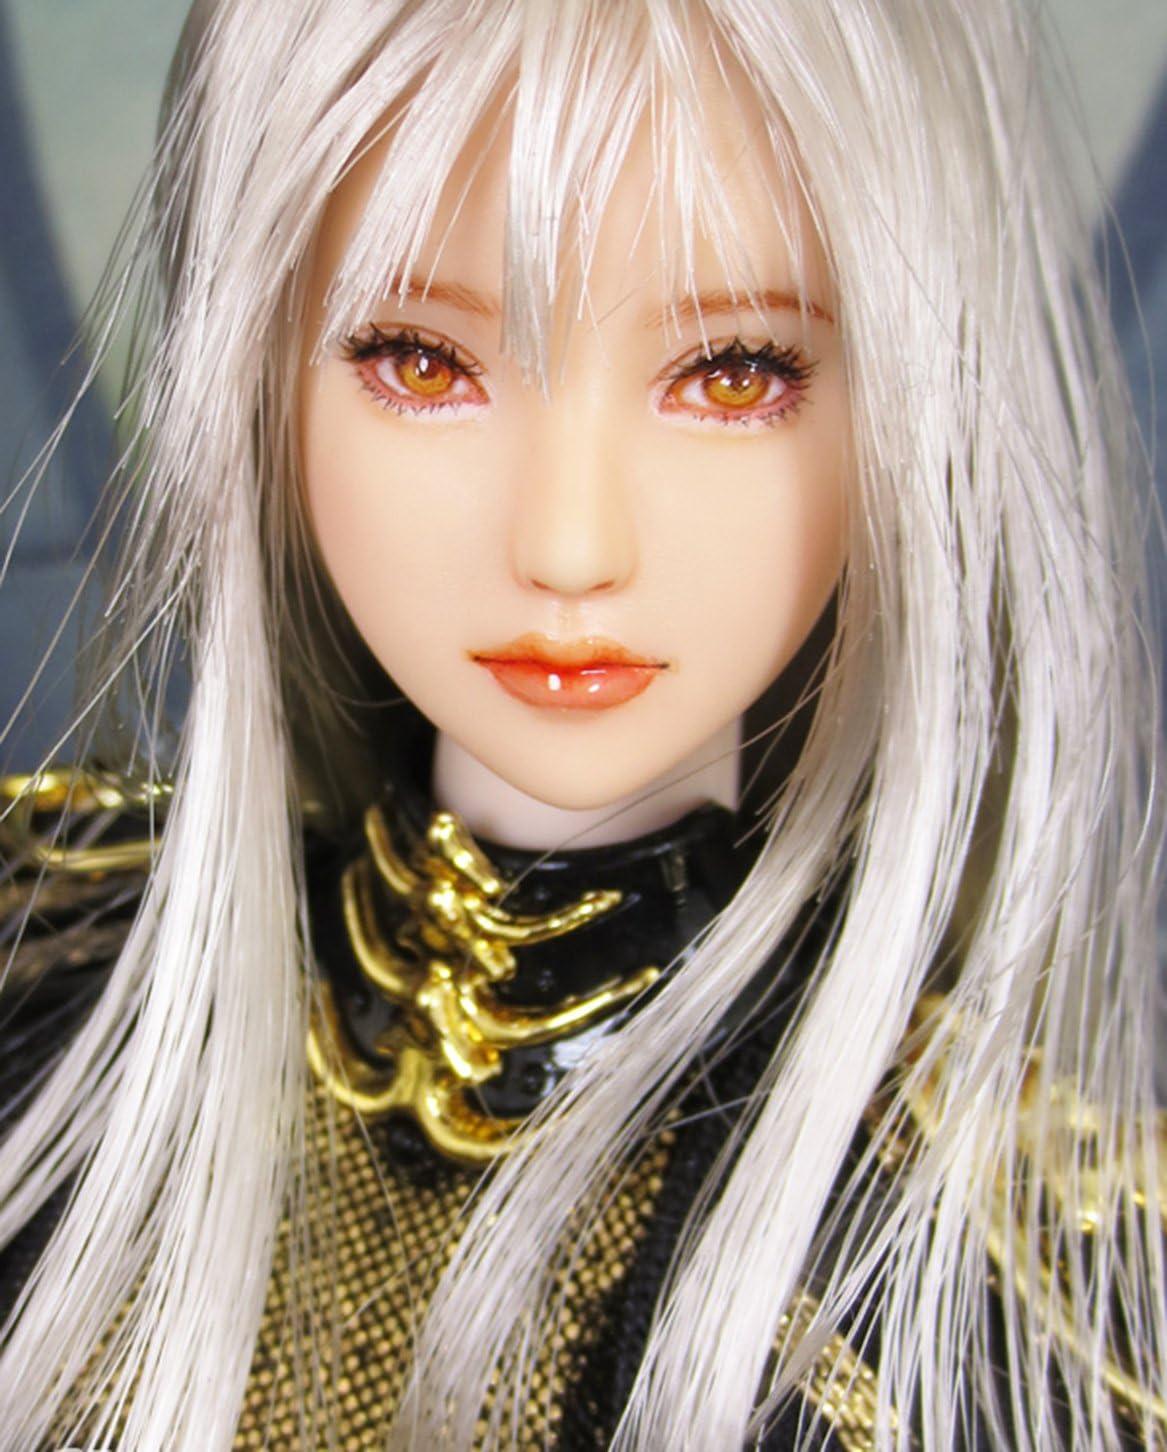 Anime Style Beauty Charming Girl Doll Head for 12 Action Figure TBLeague//Obitsu//JIAOU CDH65 HiPlay 1//6 Scale Female Figure Head Sculpt 100/% Handmade /& Customized Makeup Natural Skin